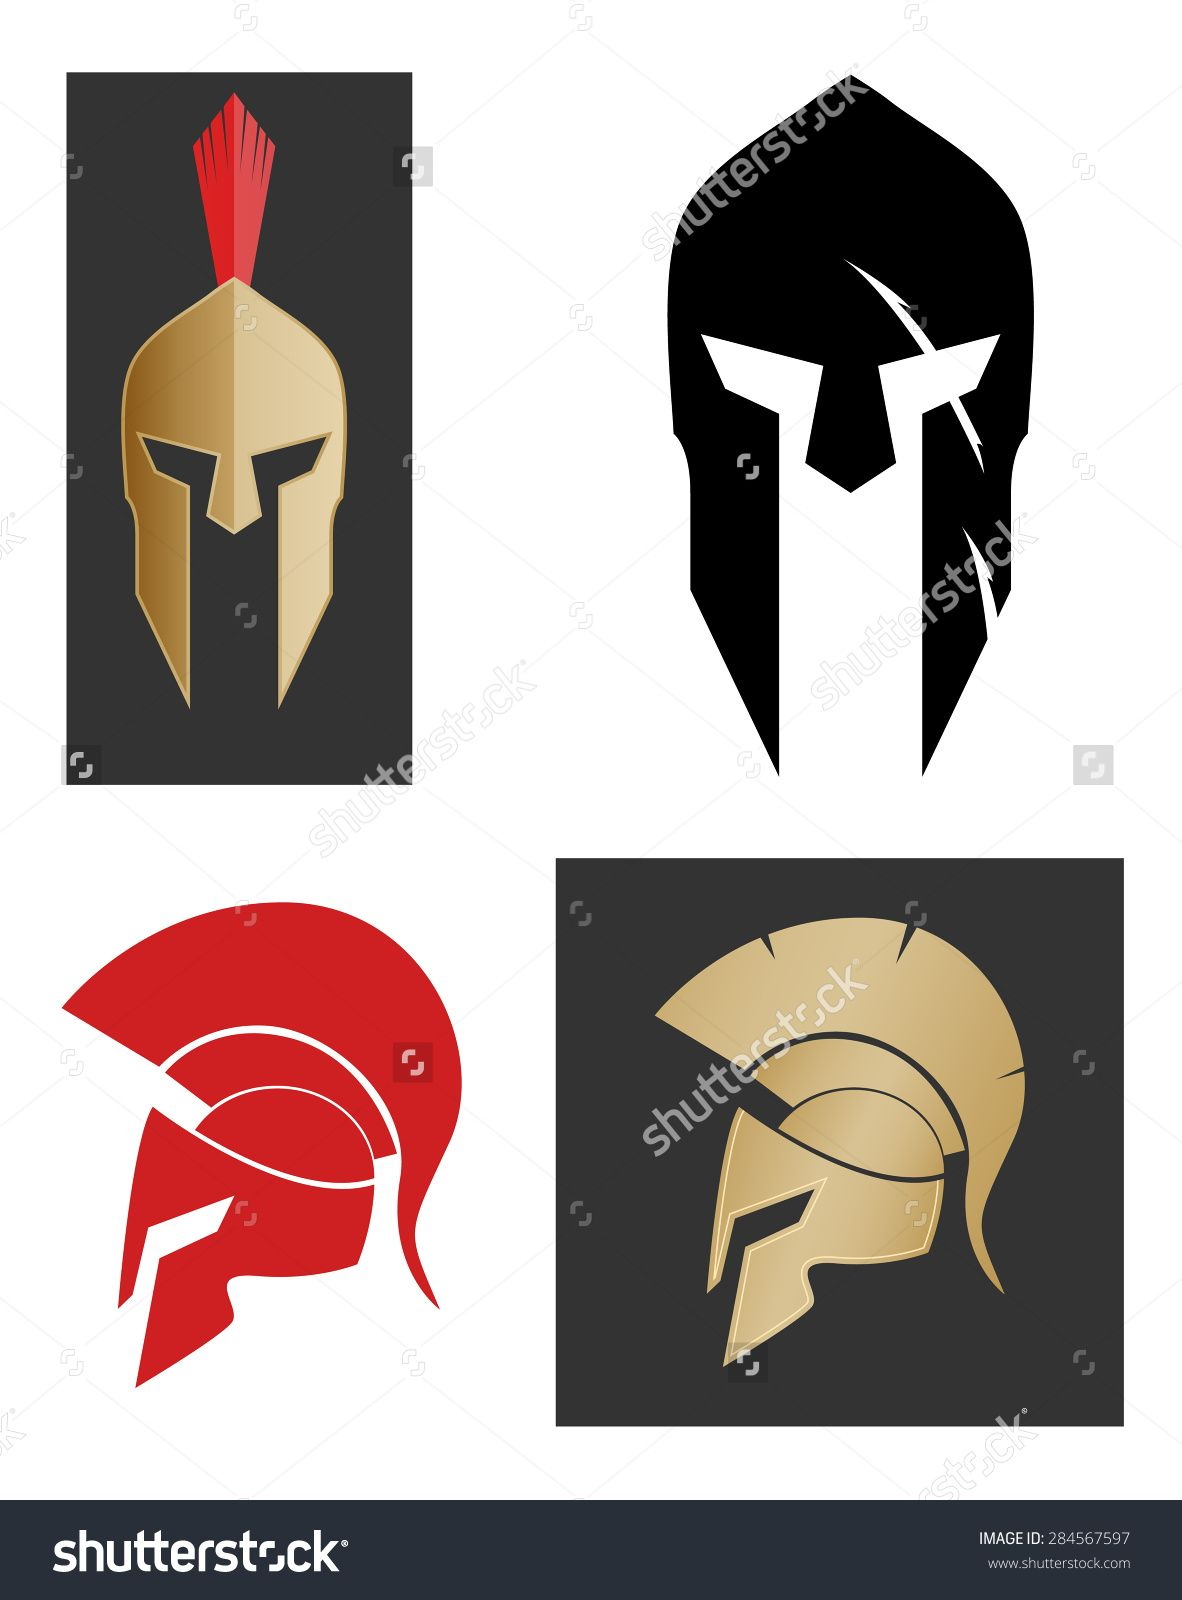 Spartan helmet Spartan helmet, Spartan tattoo, Spartan